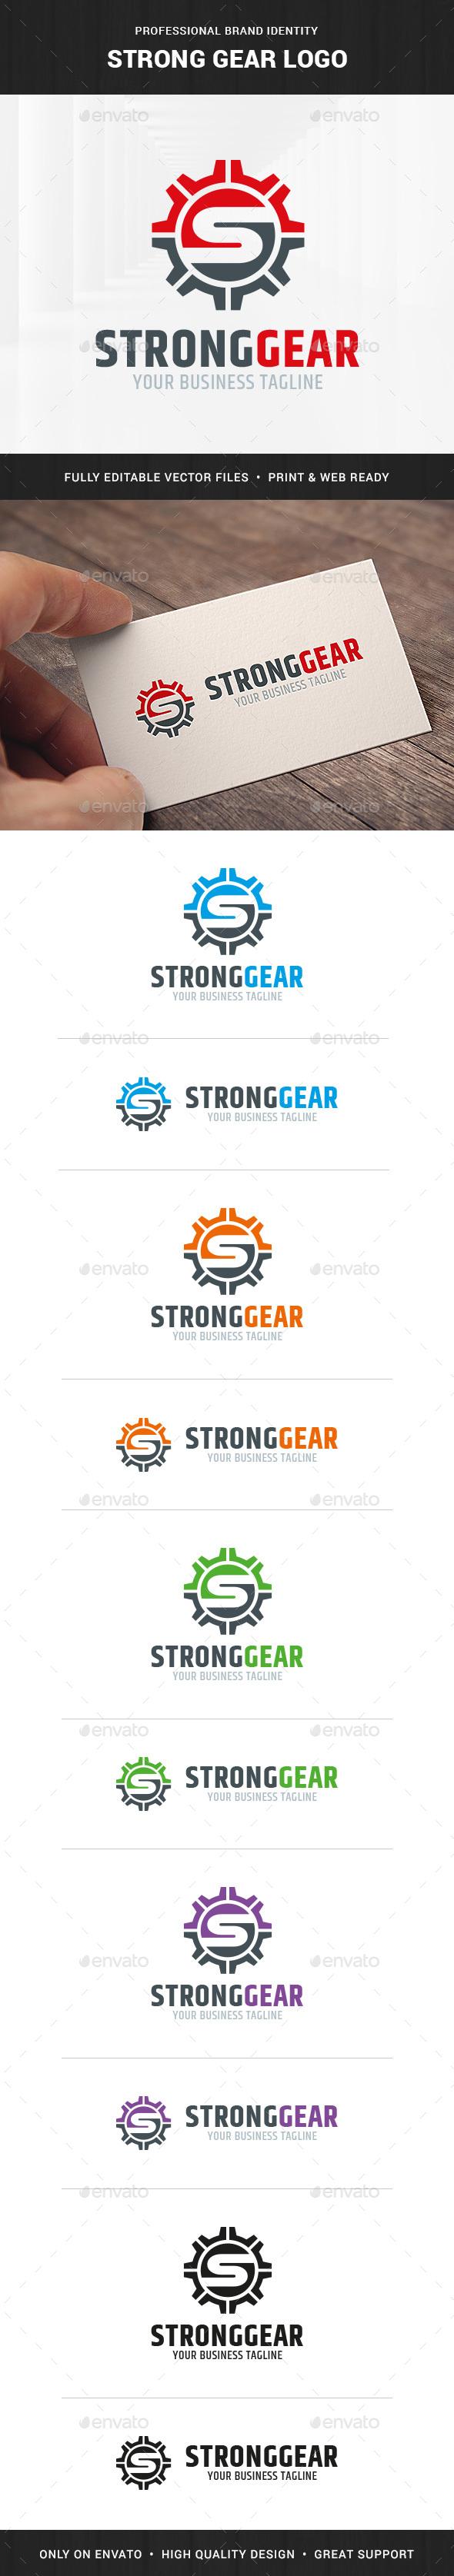 Strong Gear - Letter S Logo